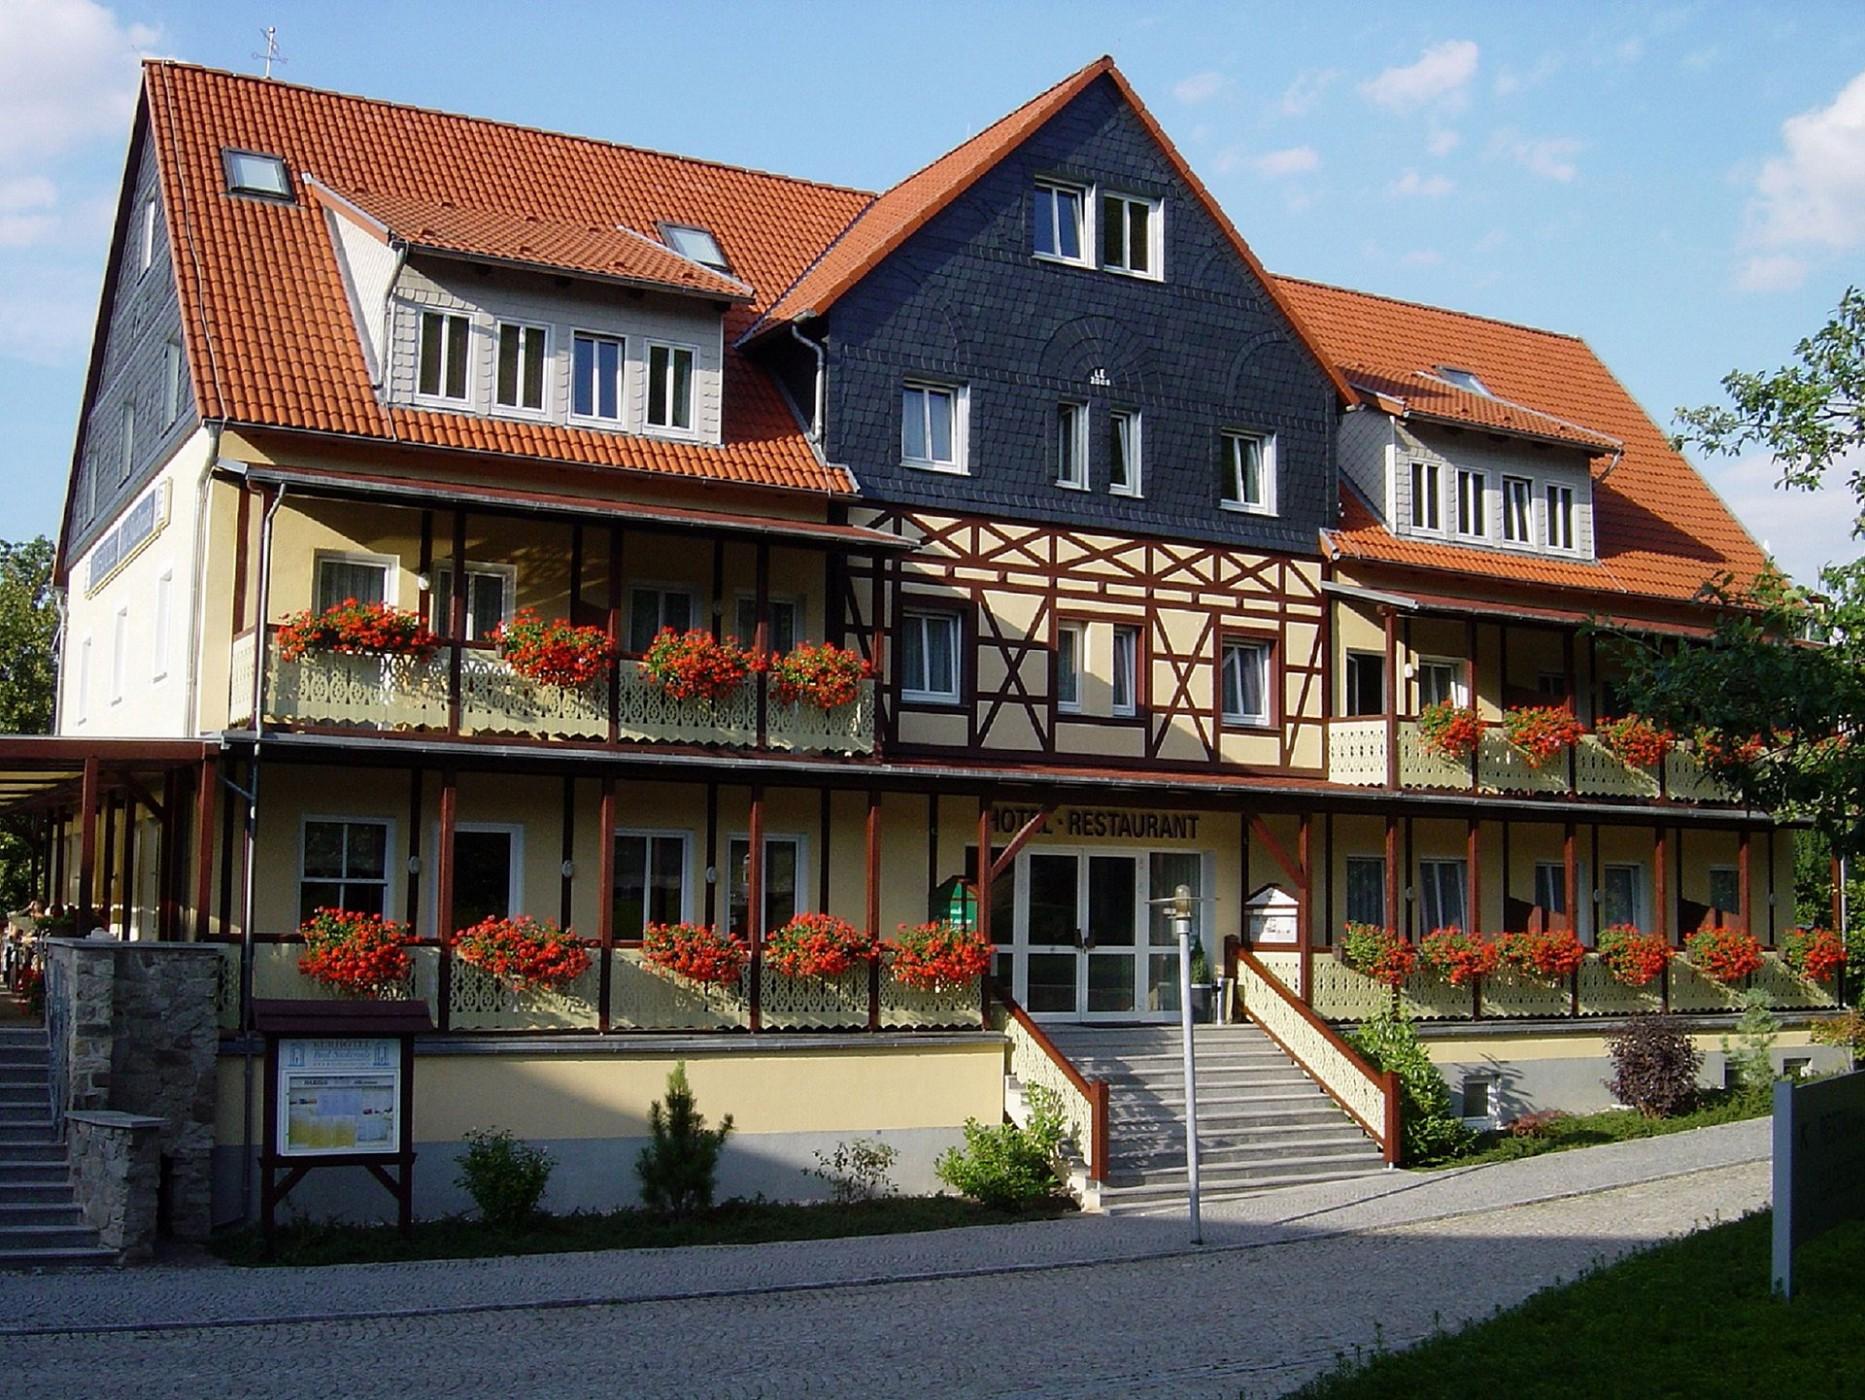 BrainLight-Lounge im Kurhotel Bad Suderode